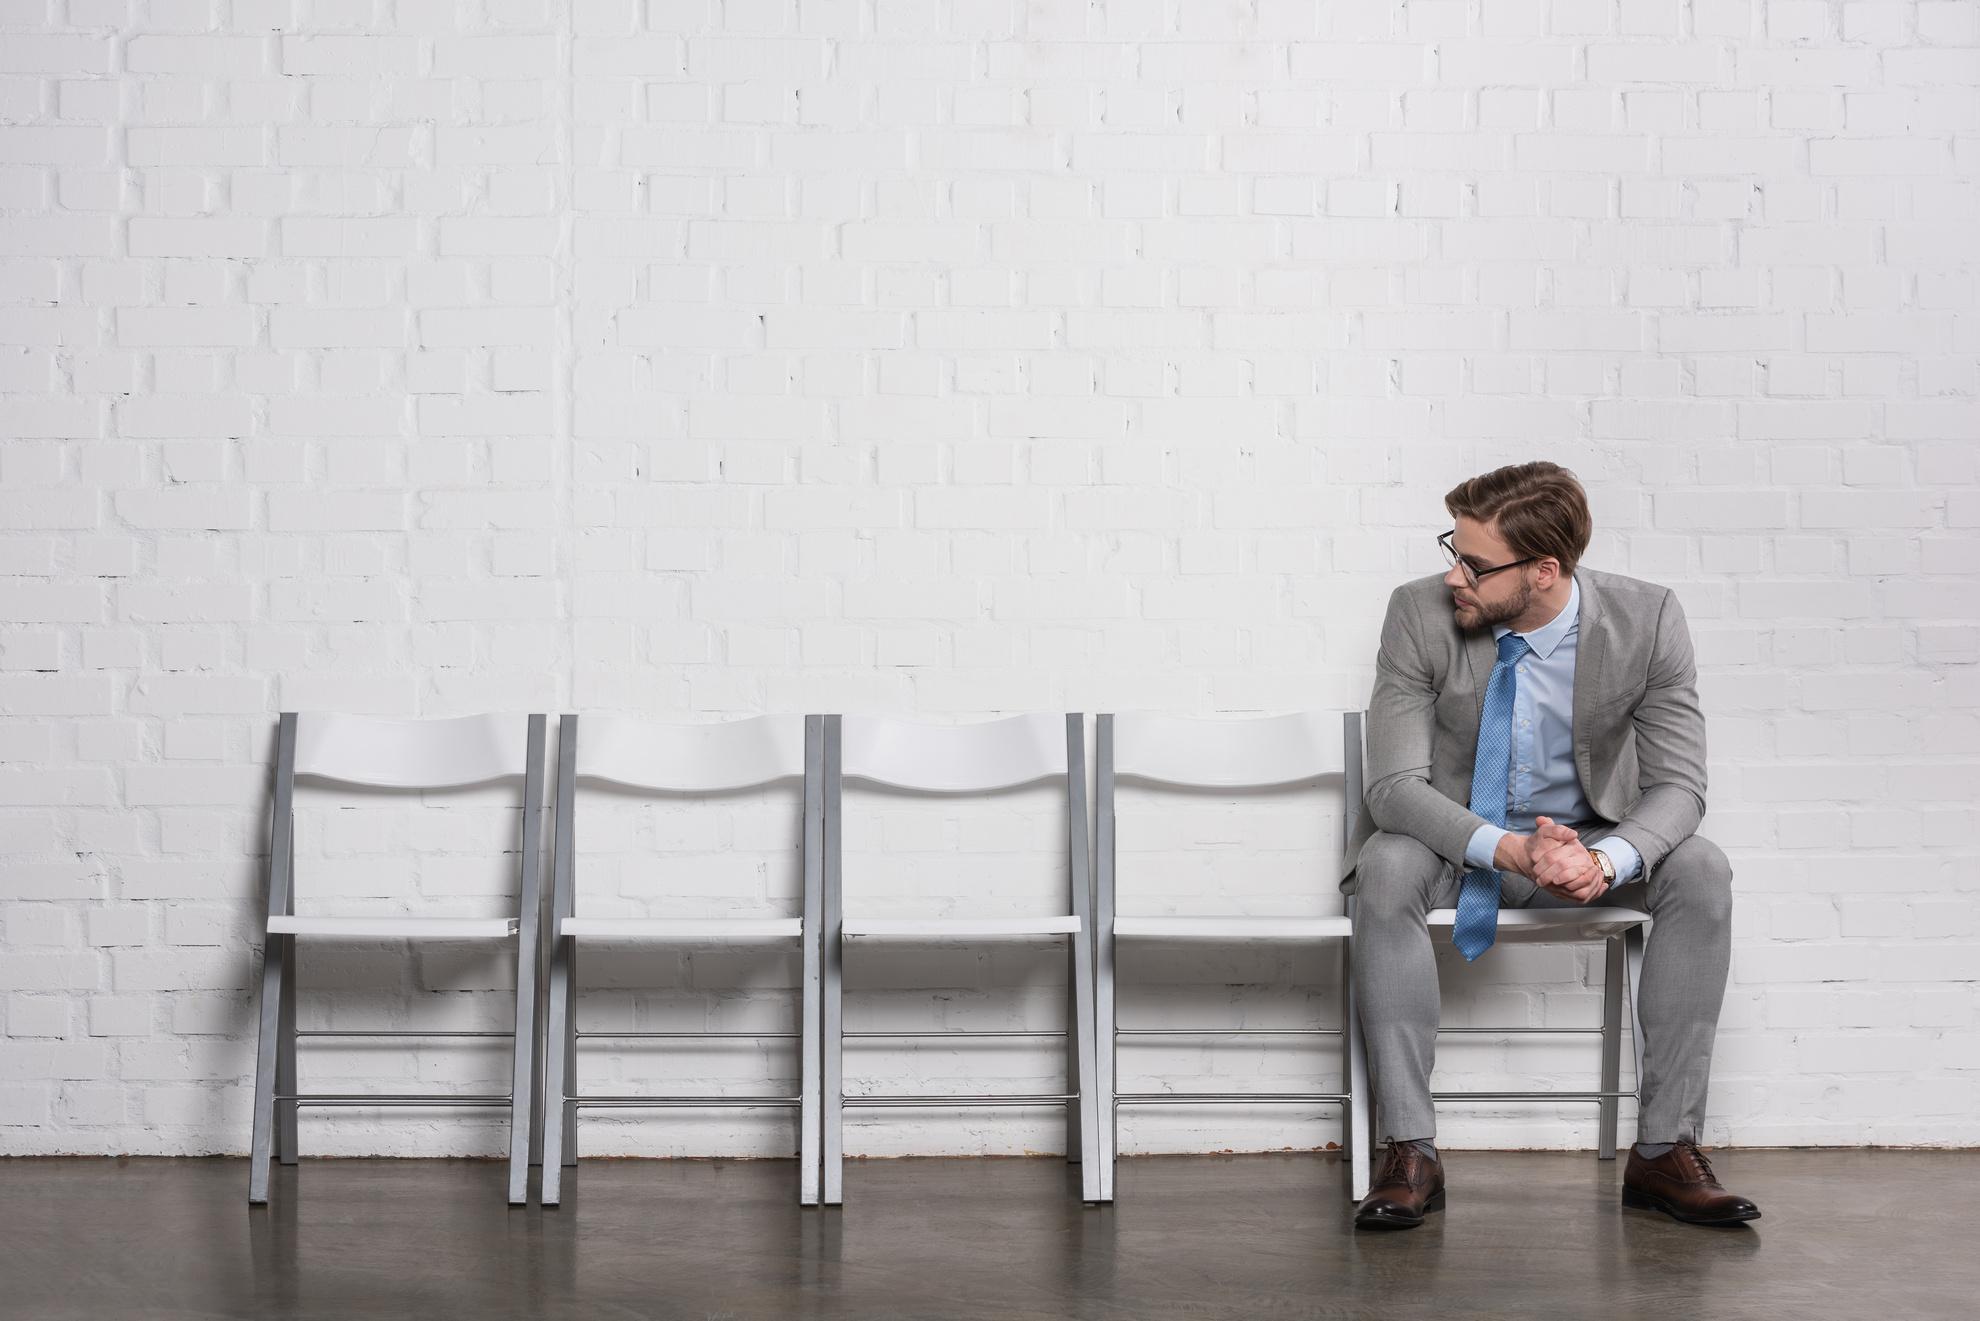 Fachkräftemangel in der Digitalindustrie - Leere Stühle